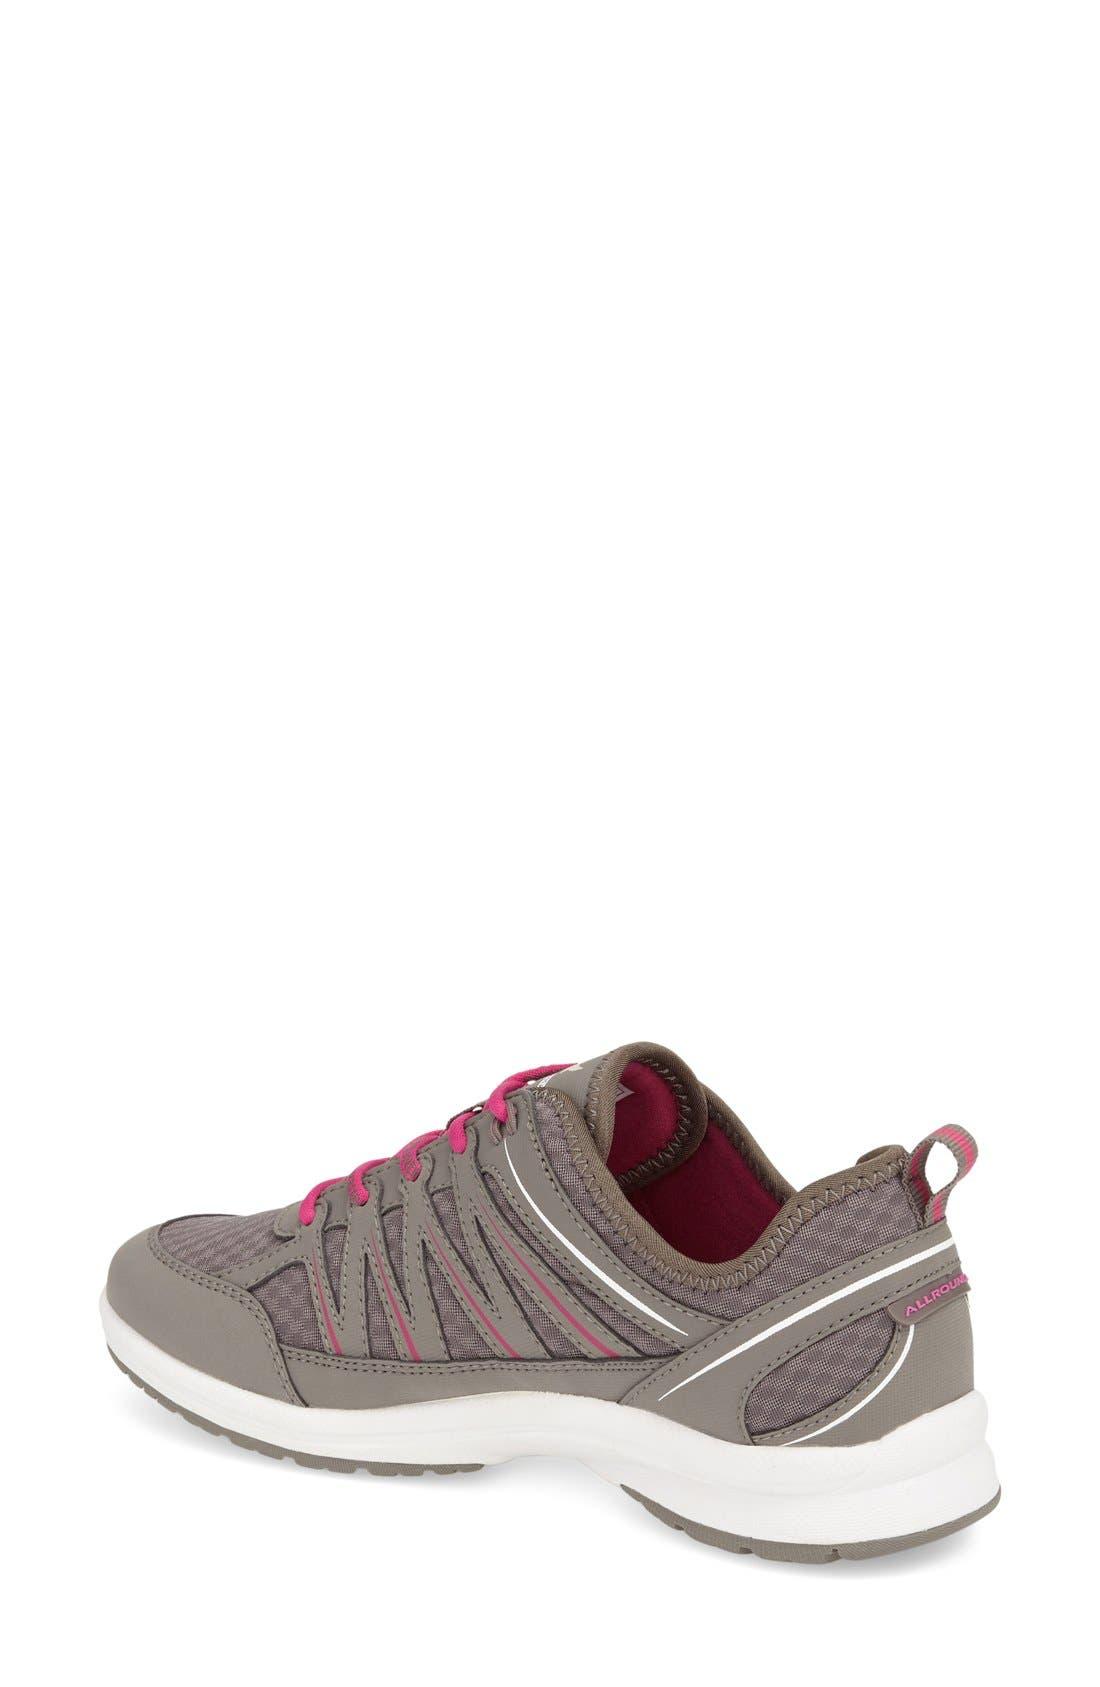 'Darina' Sneaker,                             Alternate thumbnail 4, color,                             Grigio Nubuck Leather